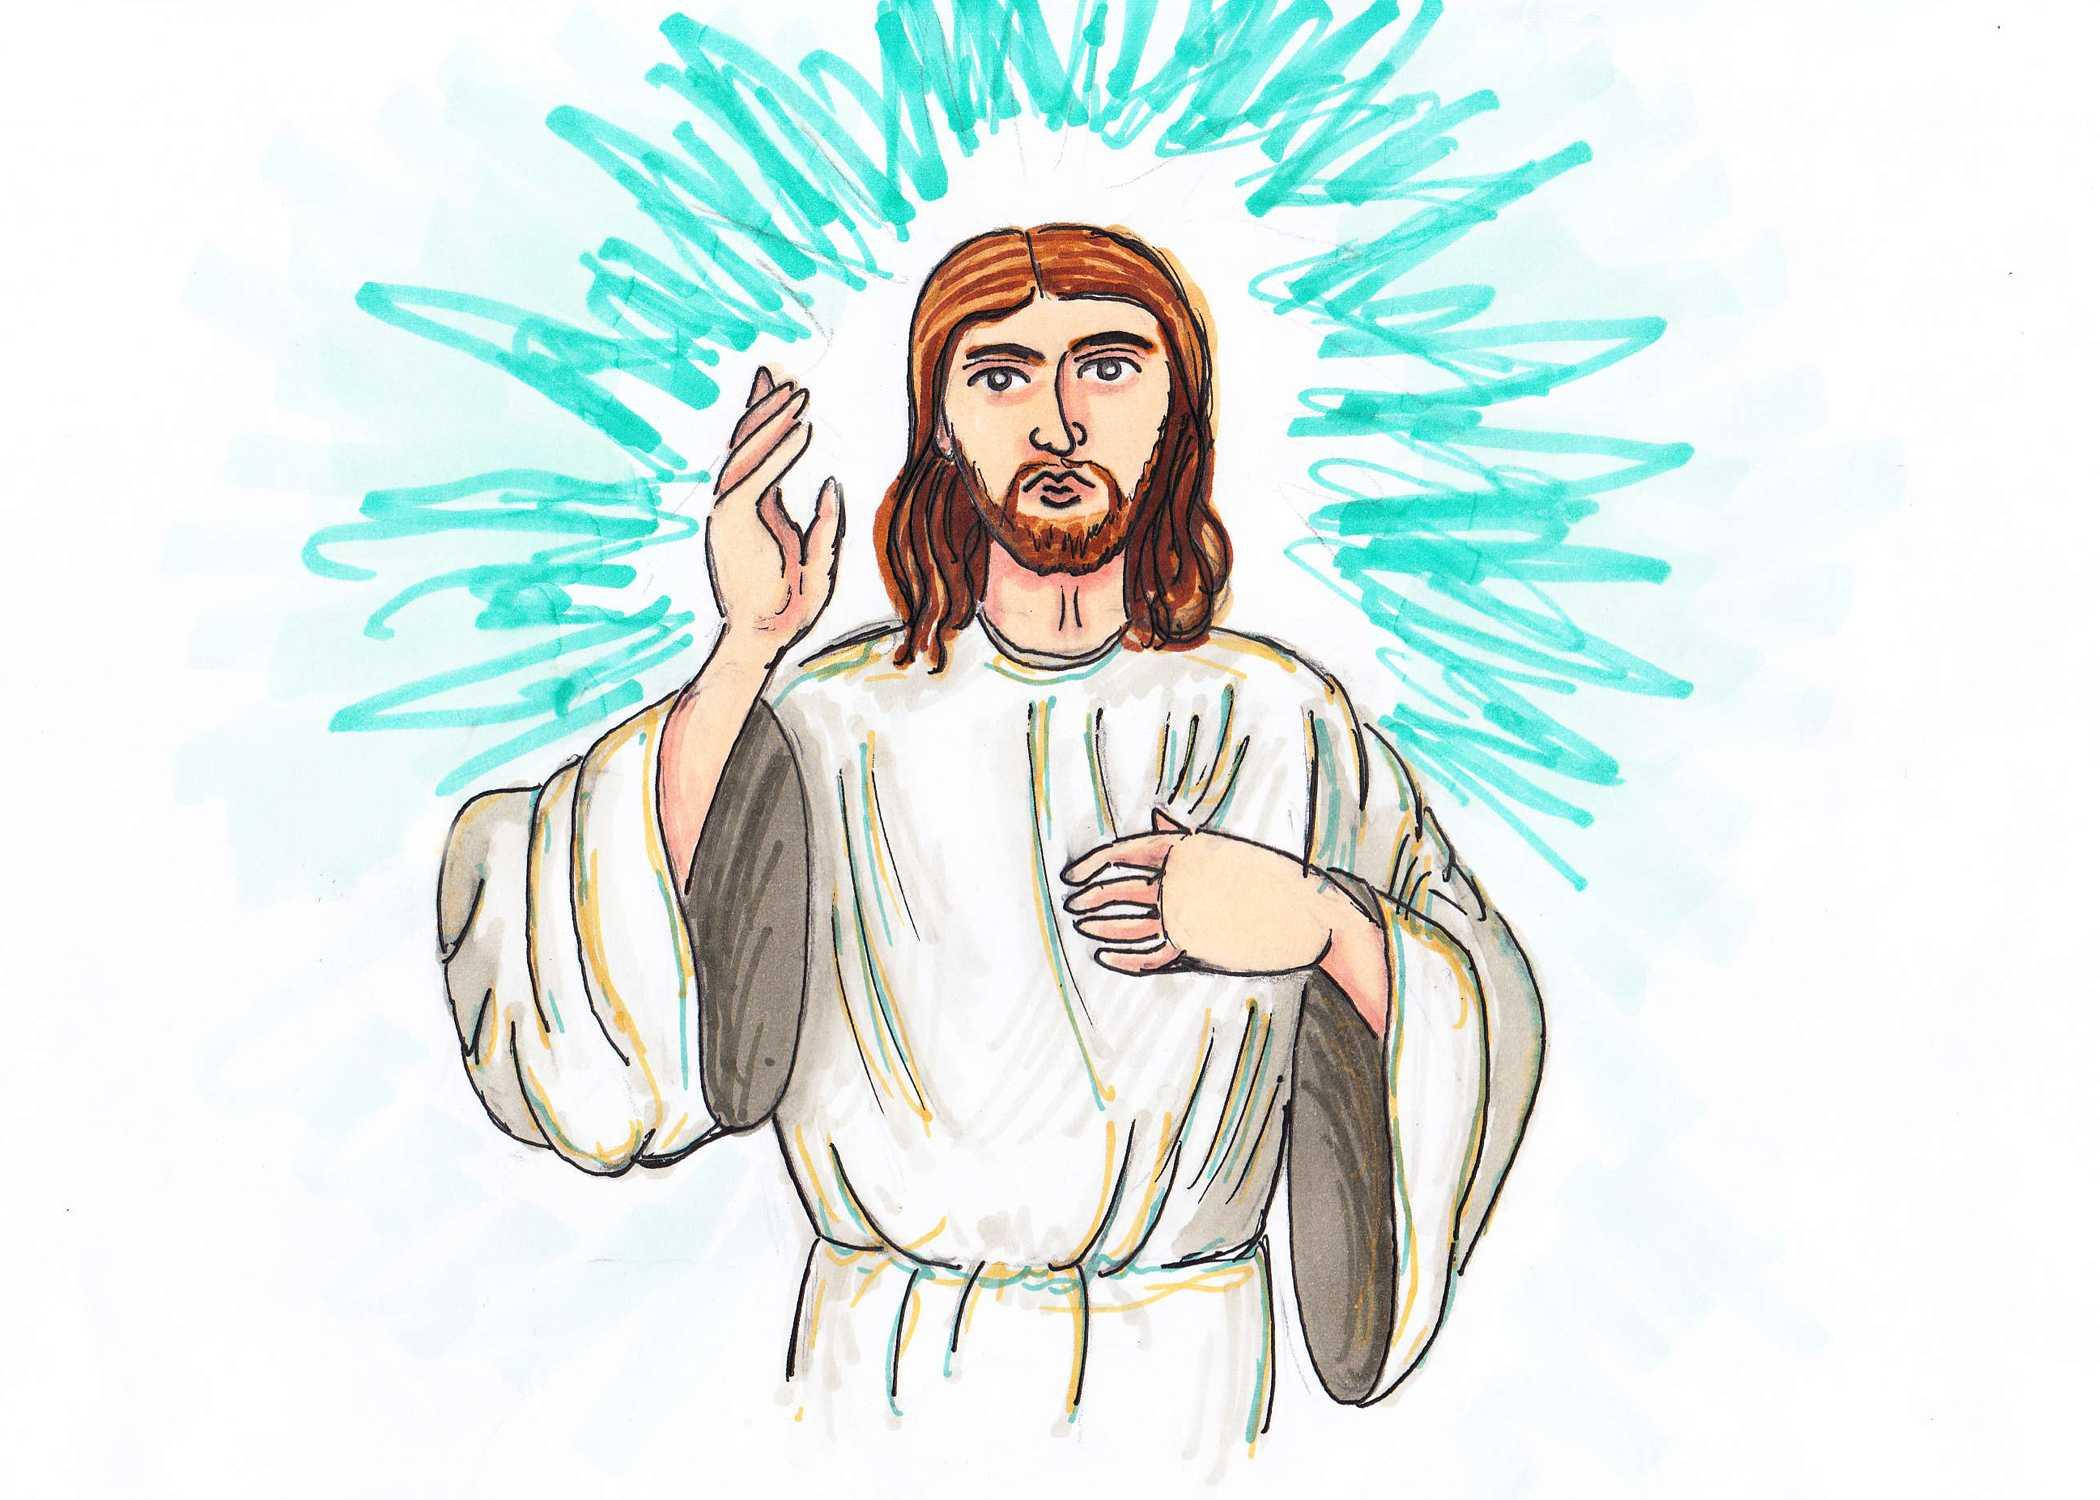 jesuscjart Opinion: What on Earth did Jesus really teach?